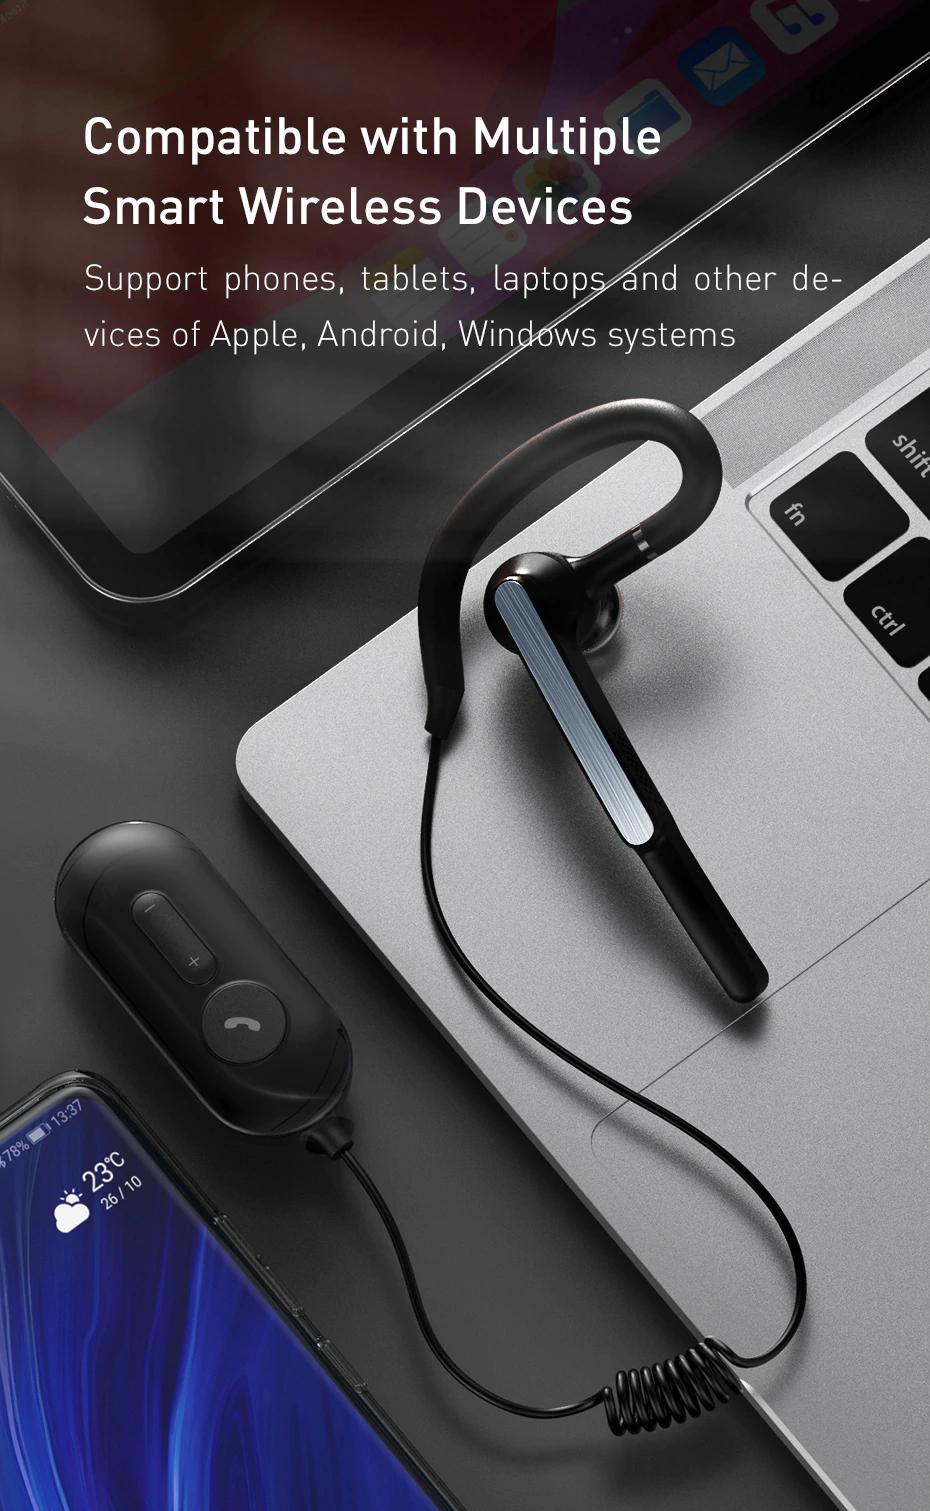 Baseus A10 Bluetooth Headset Aptx Wireless Bluetooth Earphone Ai Smart Handsfree Business Headset With Hd Mi Waterproof Bluetooth Bluetooth Earphones Handsfree